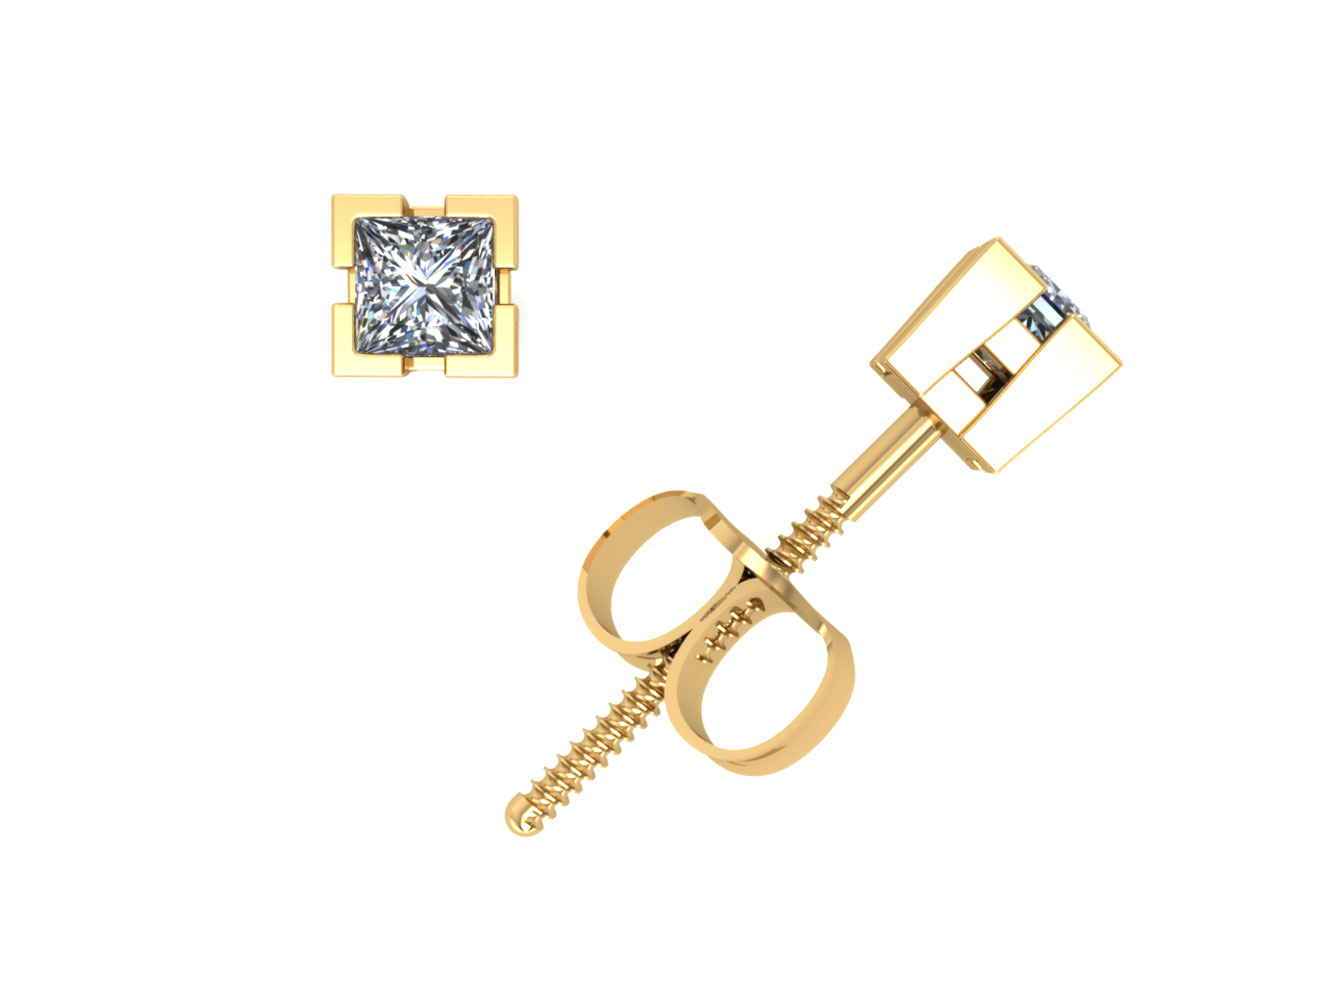 edad580d9 1/4Ct Princess Cut Diamond Basket Solitaire Stud Earrings 14k Gold V-Prong  F VS2